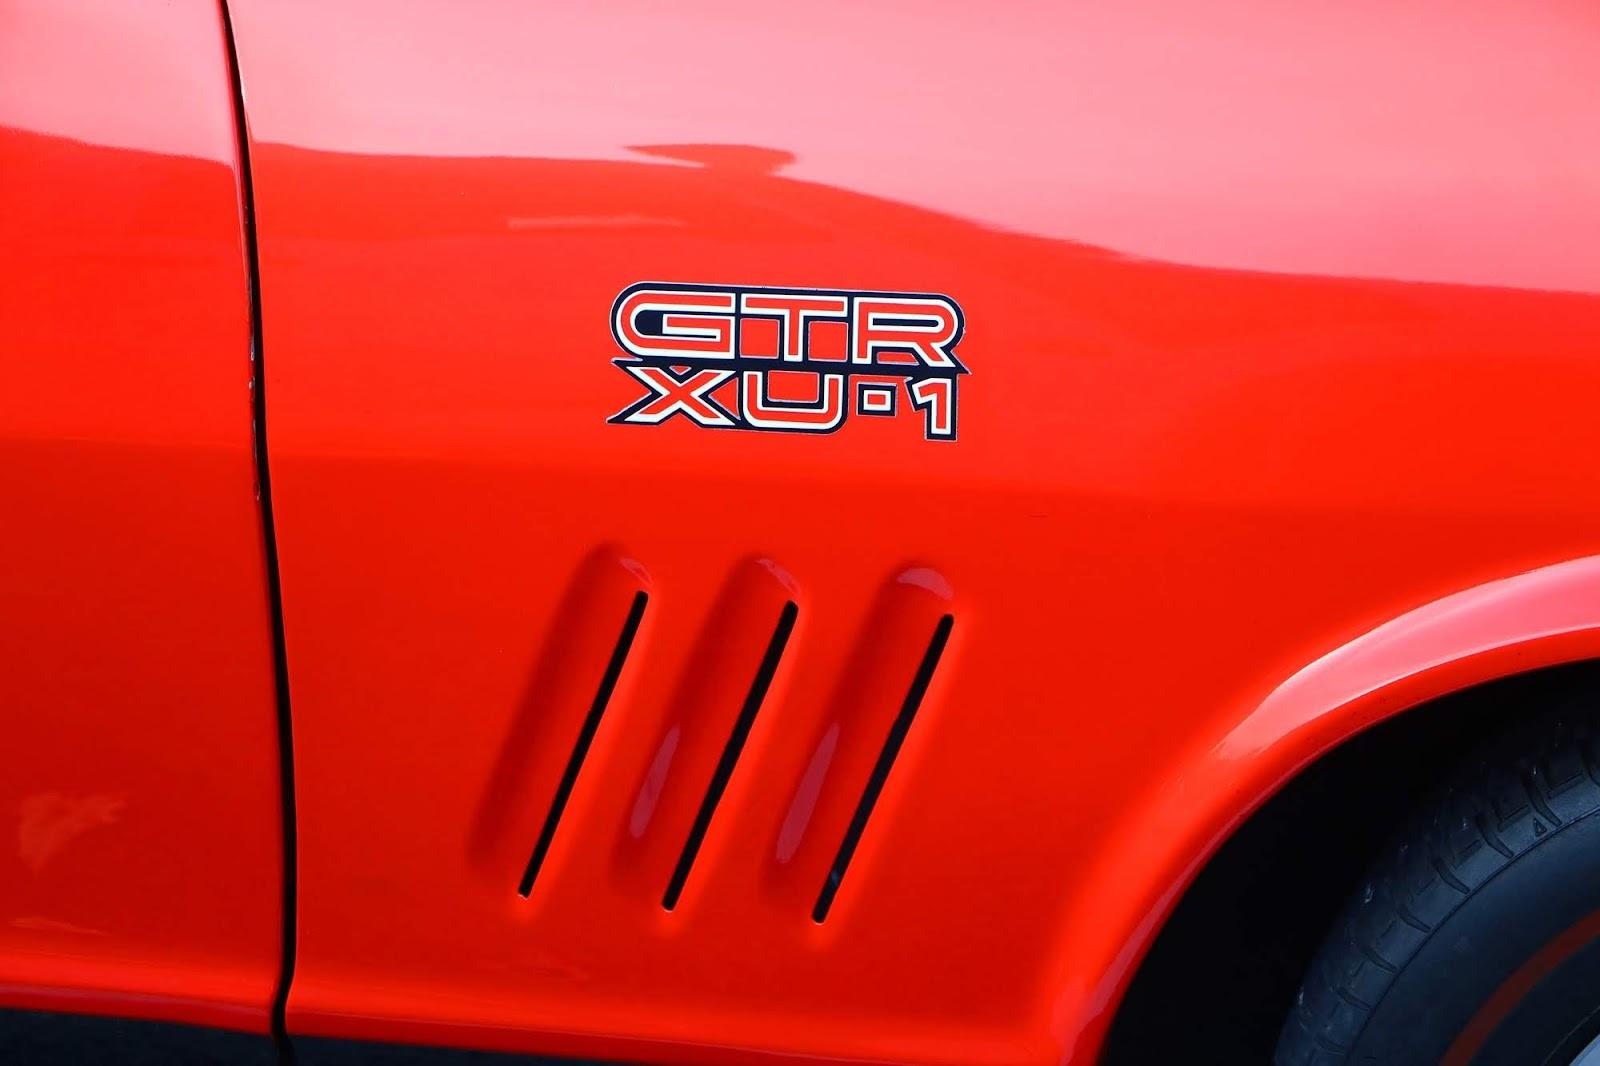 _Detail - Holden Torana GTR-XU1 Vents.jpg